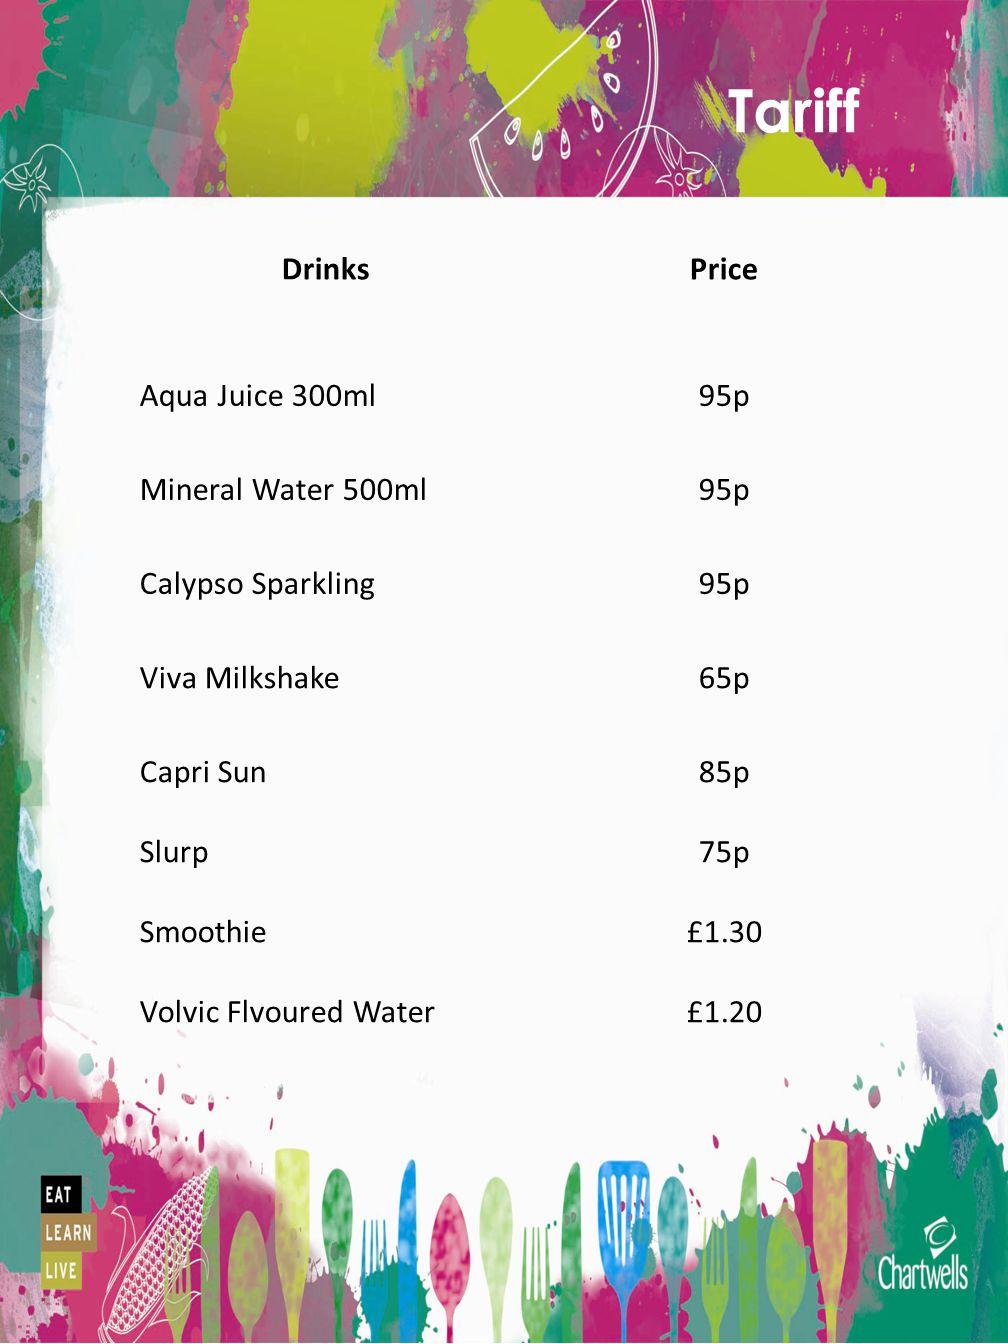 Tariff DrinksPrice Aqua Juice 300ml95p Mineral Water 500ml95p Calypso Sparkling95p Viva Milkshake65p Capri Sun Slurp Smoothie Volvic Flvoured Water 85p 75p £1.30 £1.20